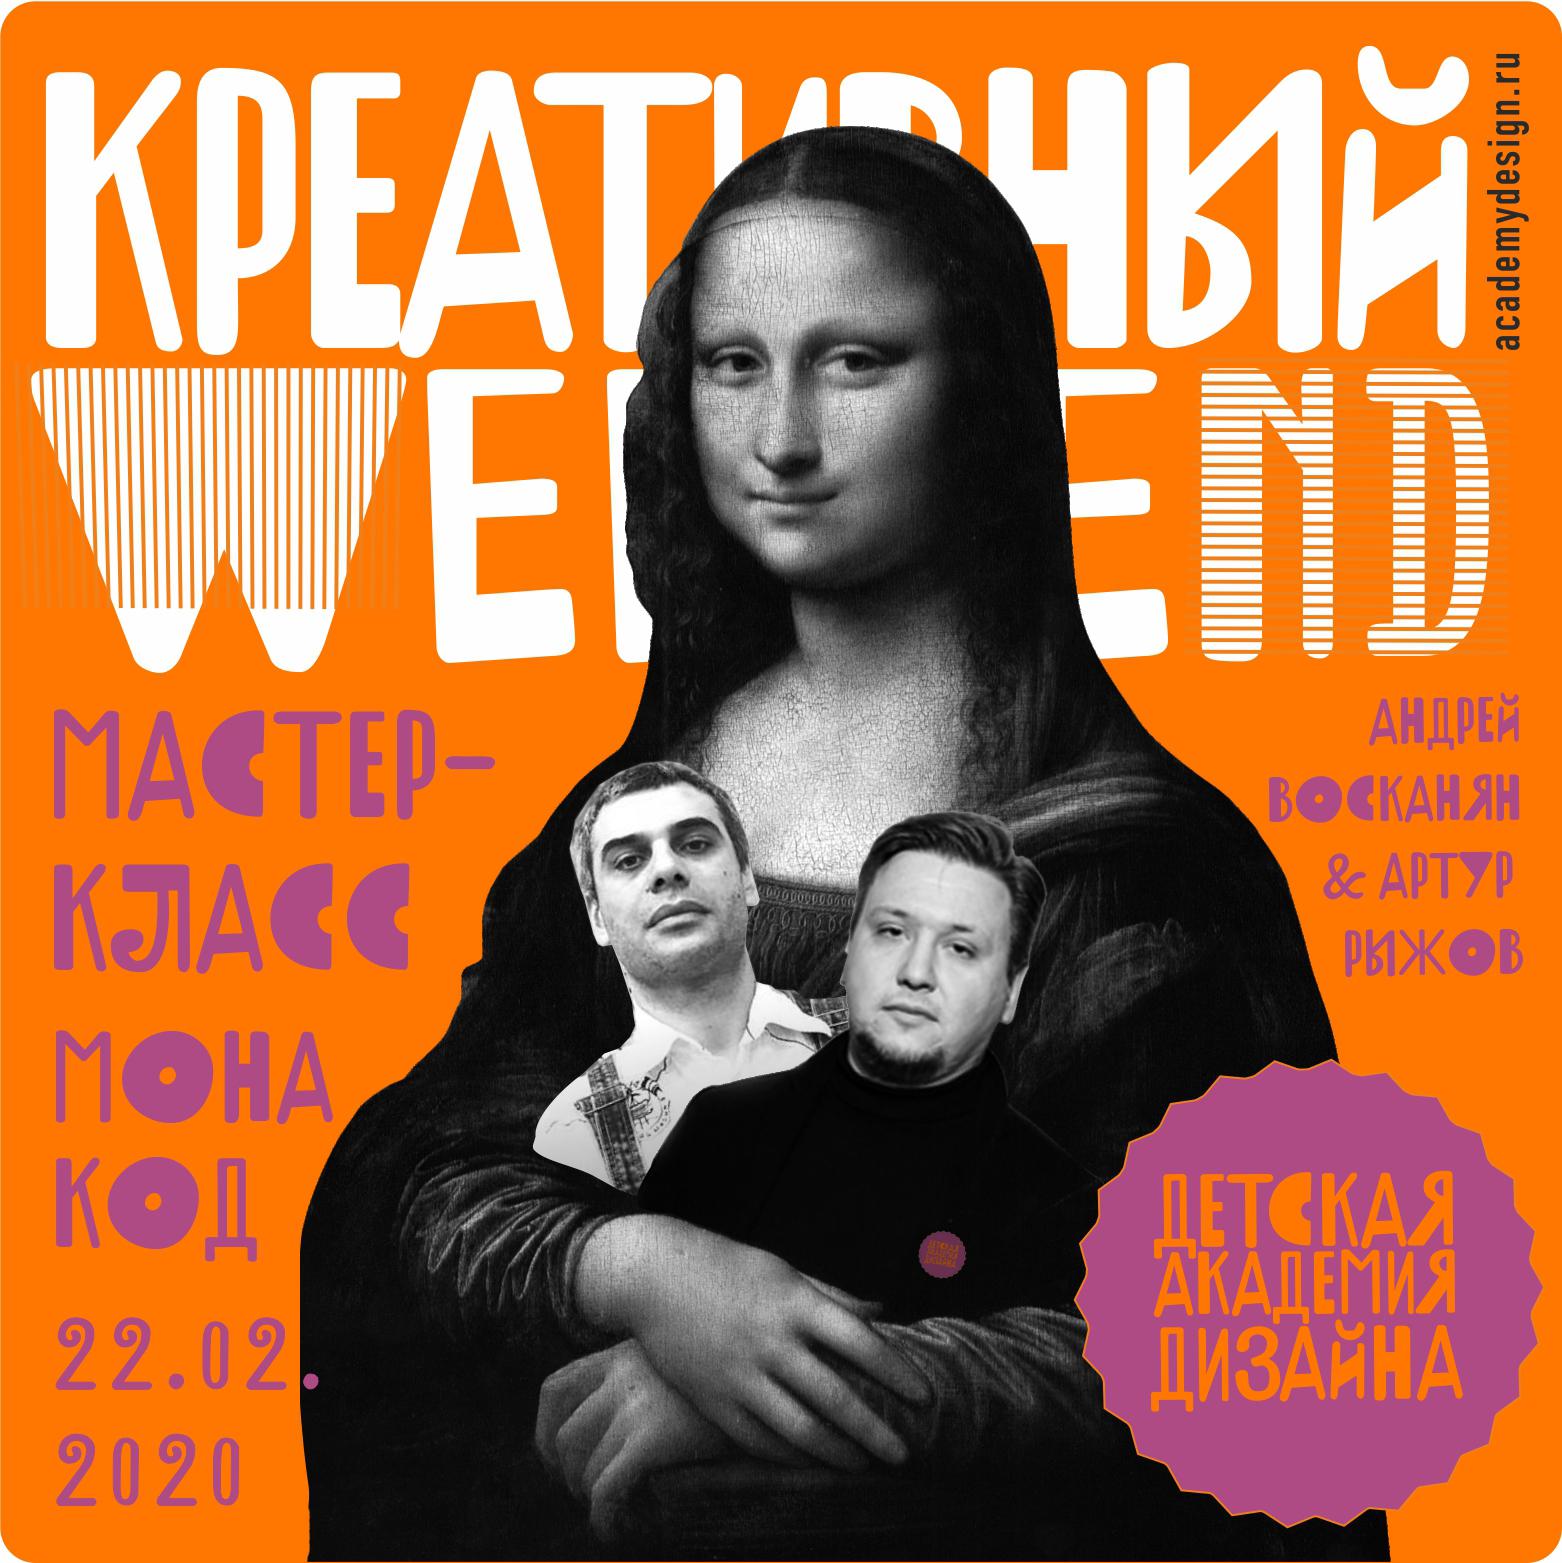 «Мона код» 22.02.2020 мастер-класс в рамках «Креативного уикенда»